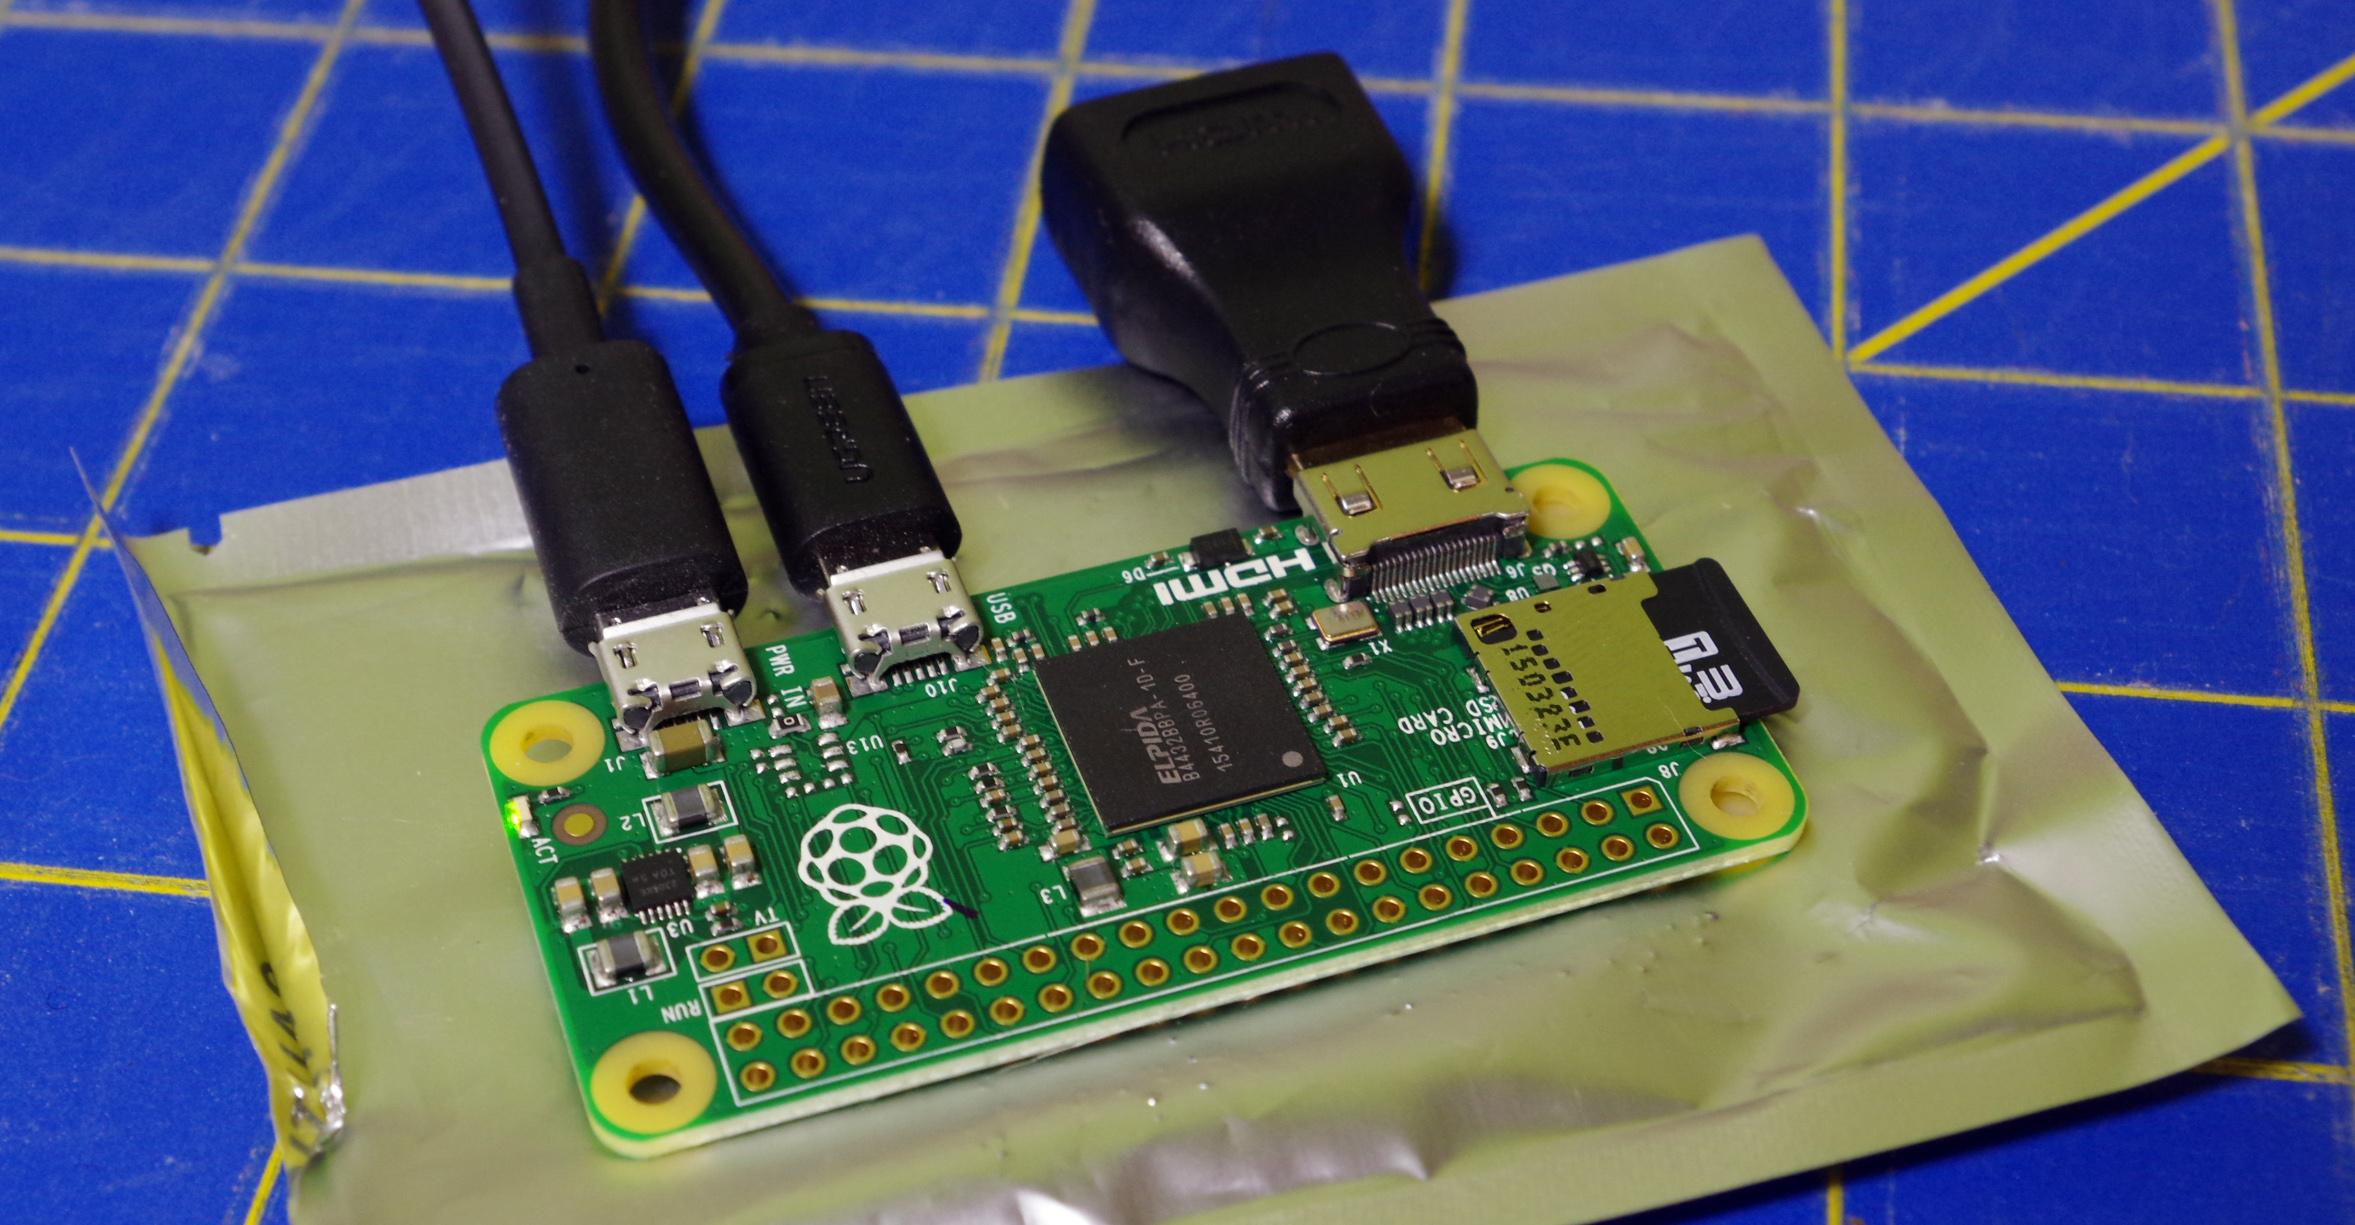 NextThing CHIP and Raspberry Pi Zero - [Blogging Intensifies]